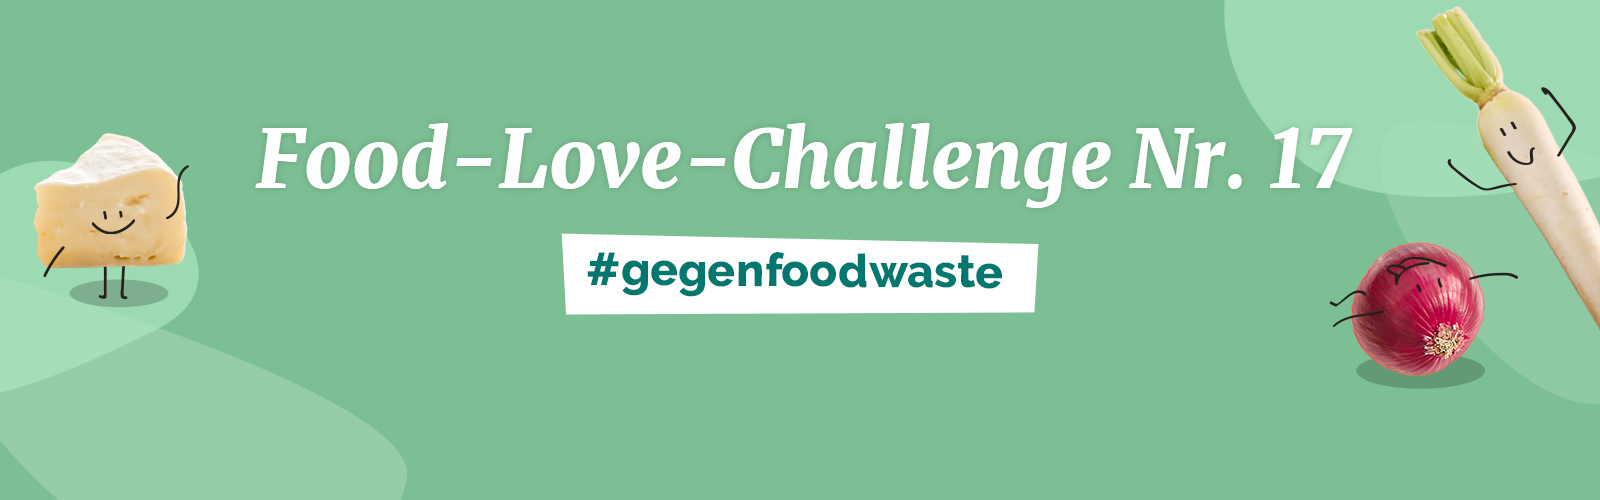 Food Love Challenge Nr. 17